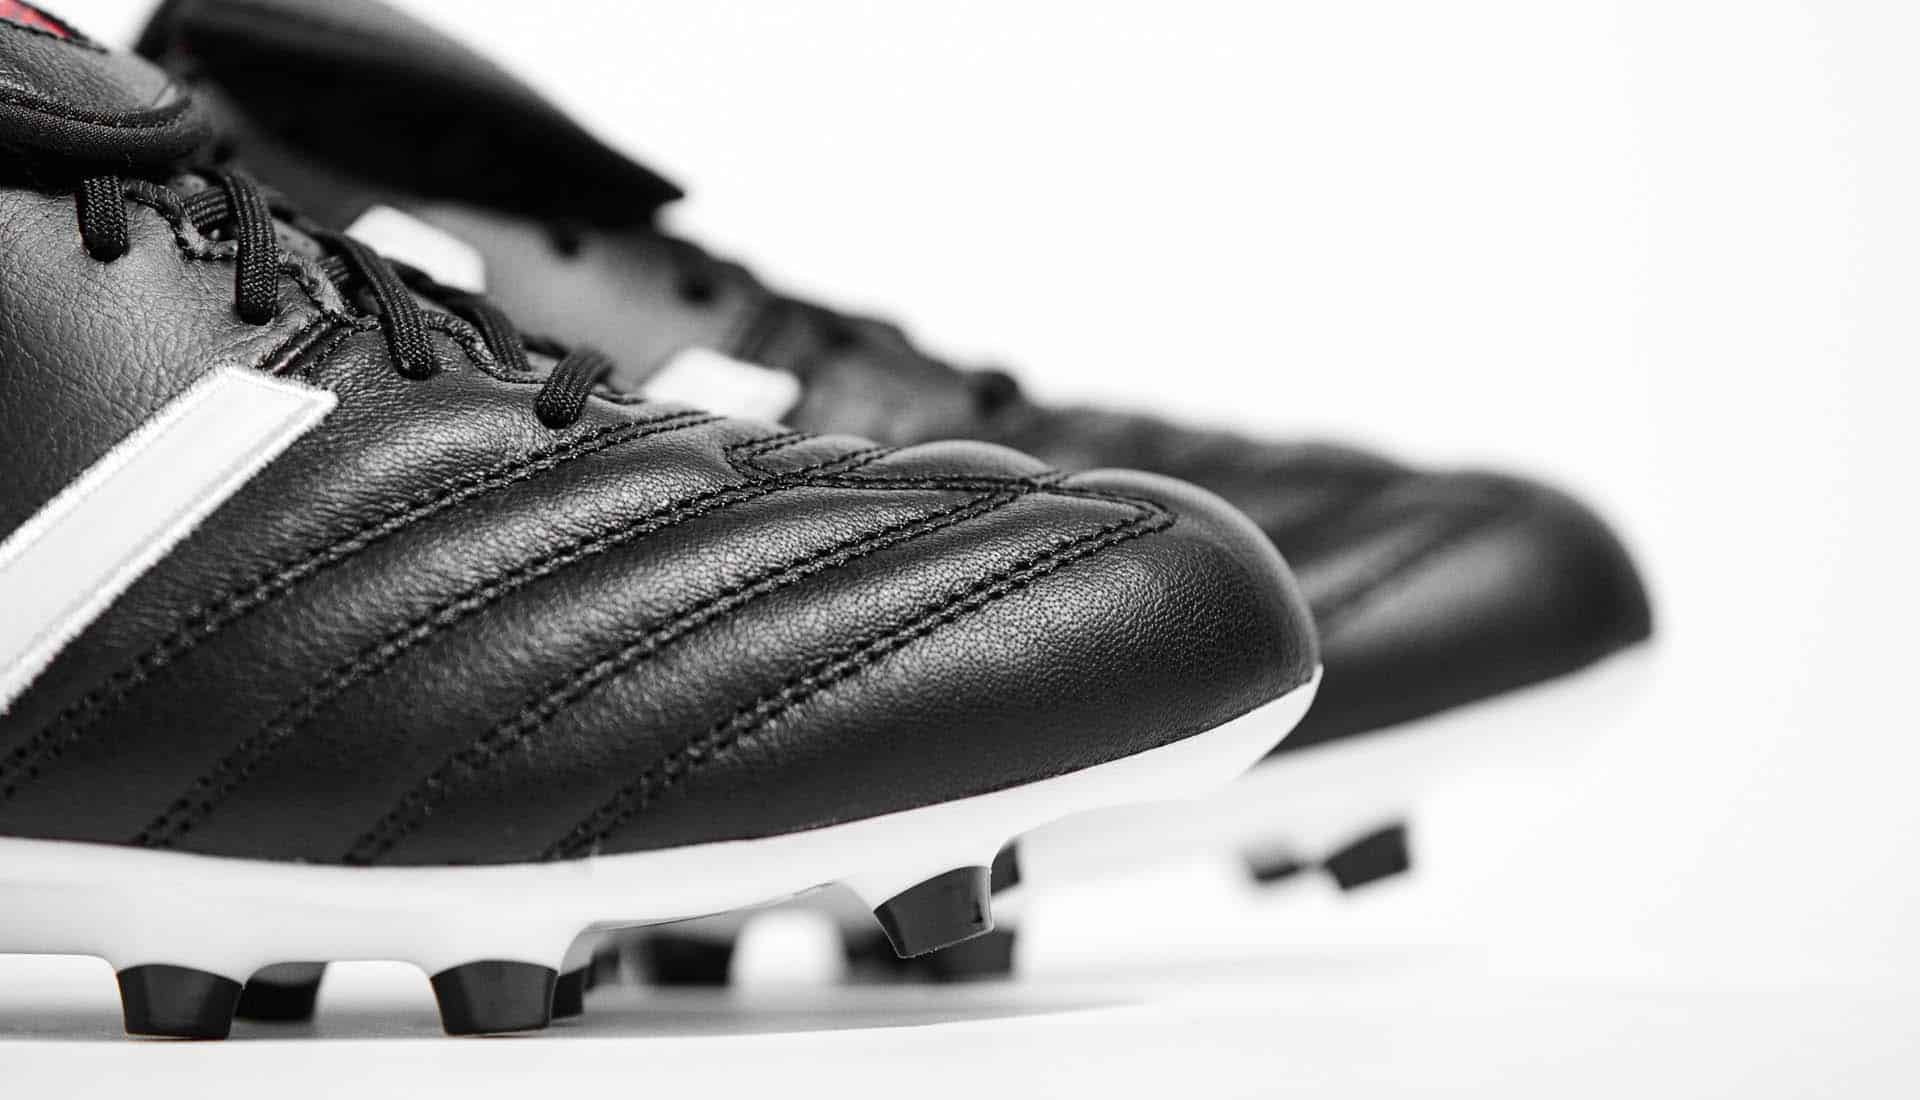 chaussures-football-New-Balance-4-4-2-noir-blanc-img1